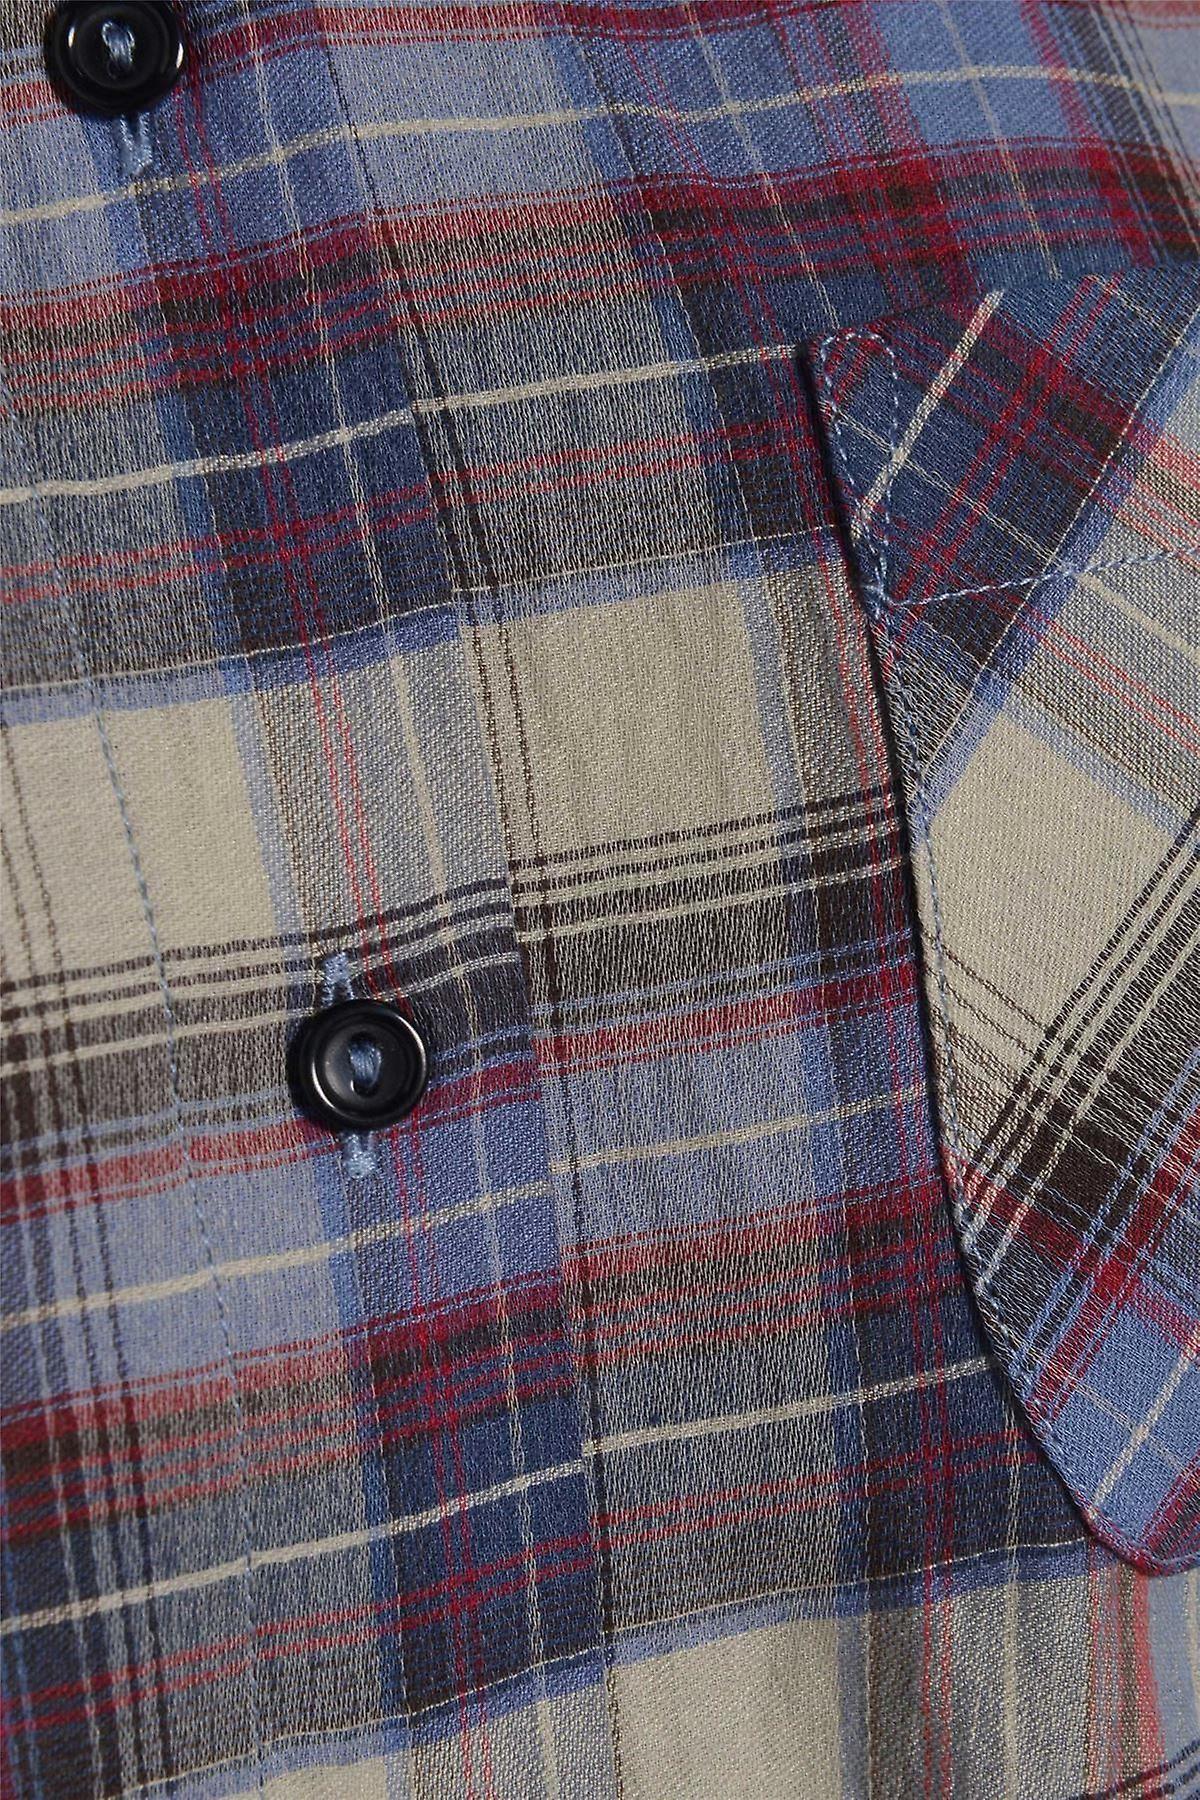 Long Sleeve Check Shirt TP554-8